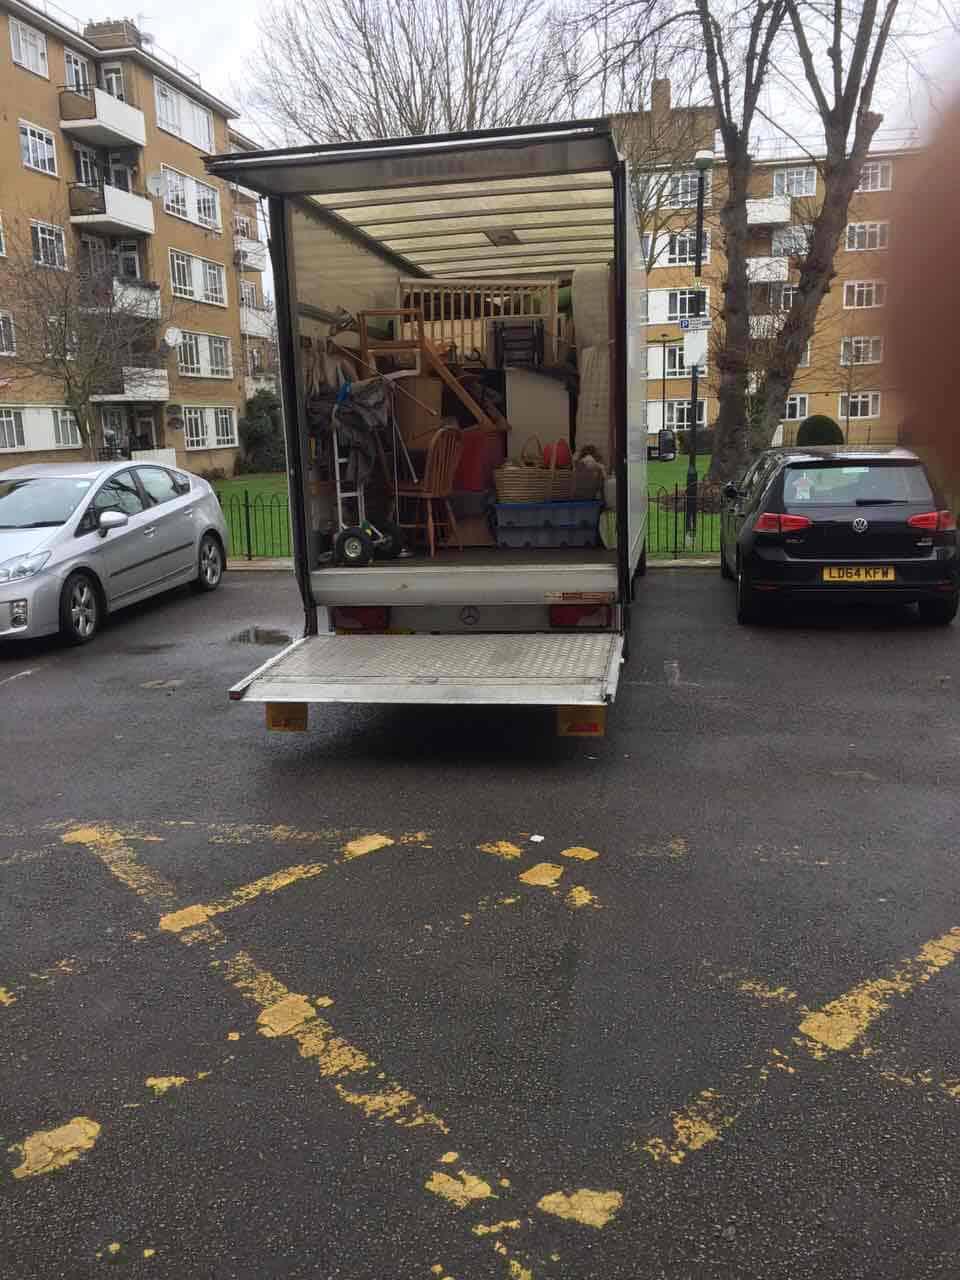 E7 moving truck